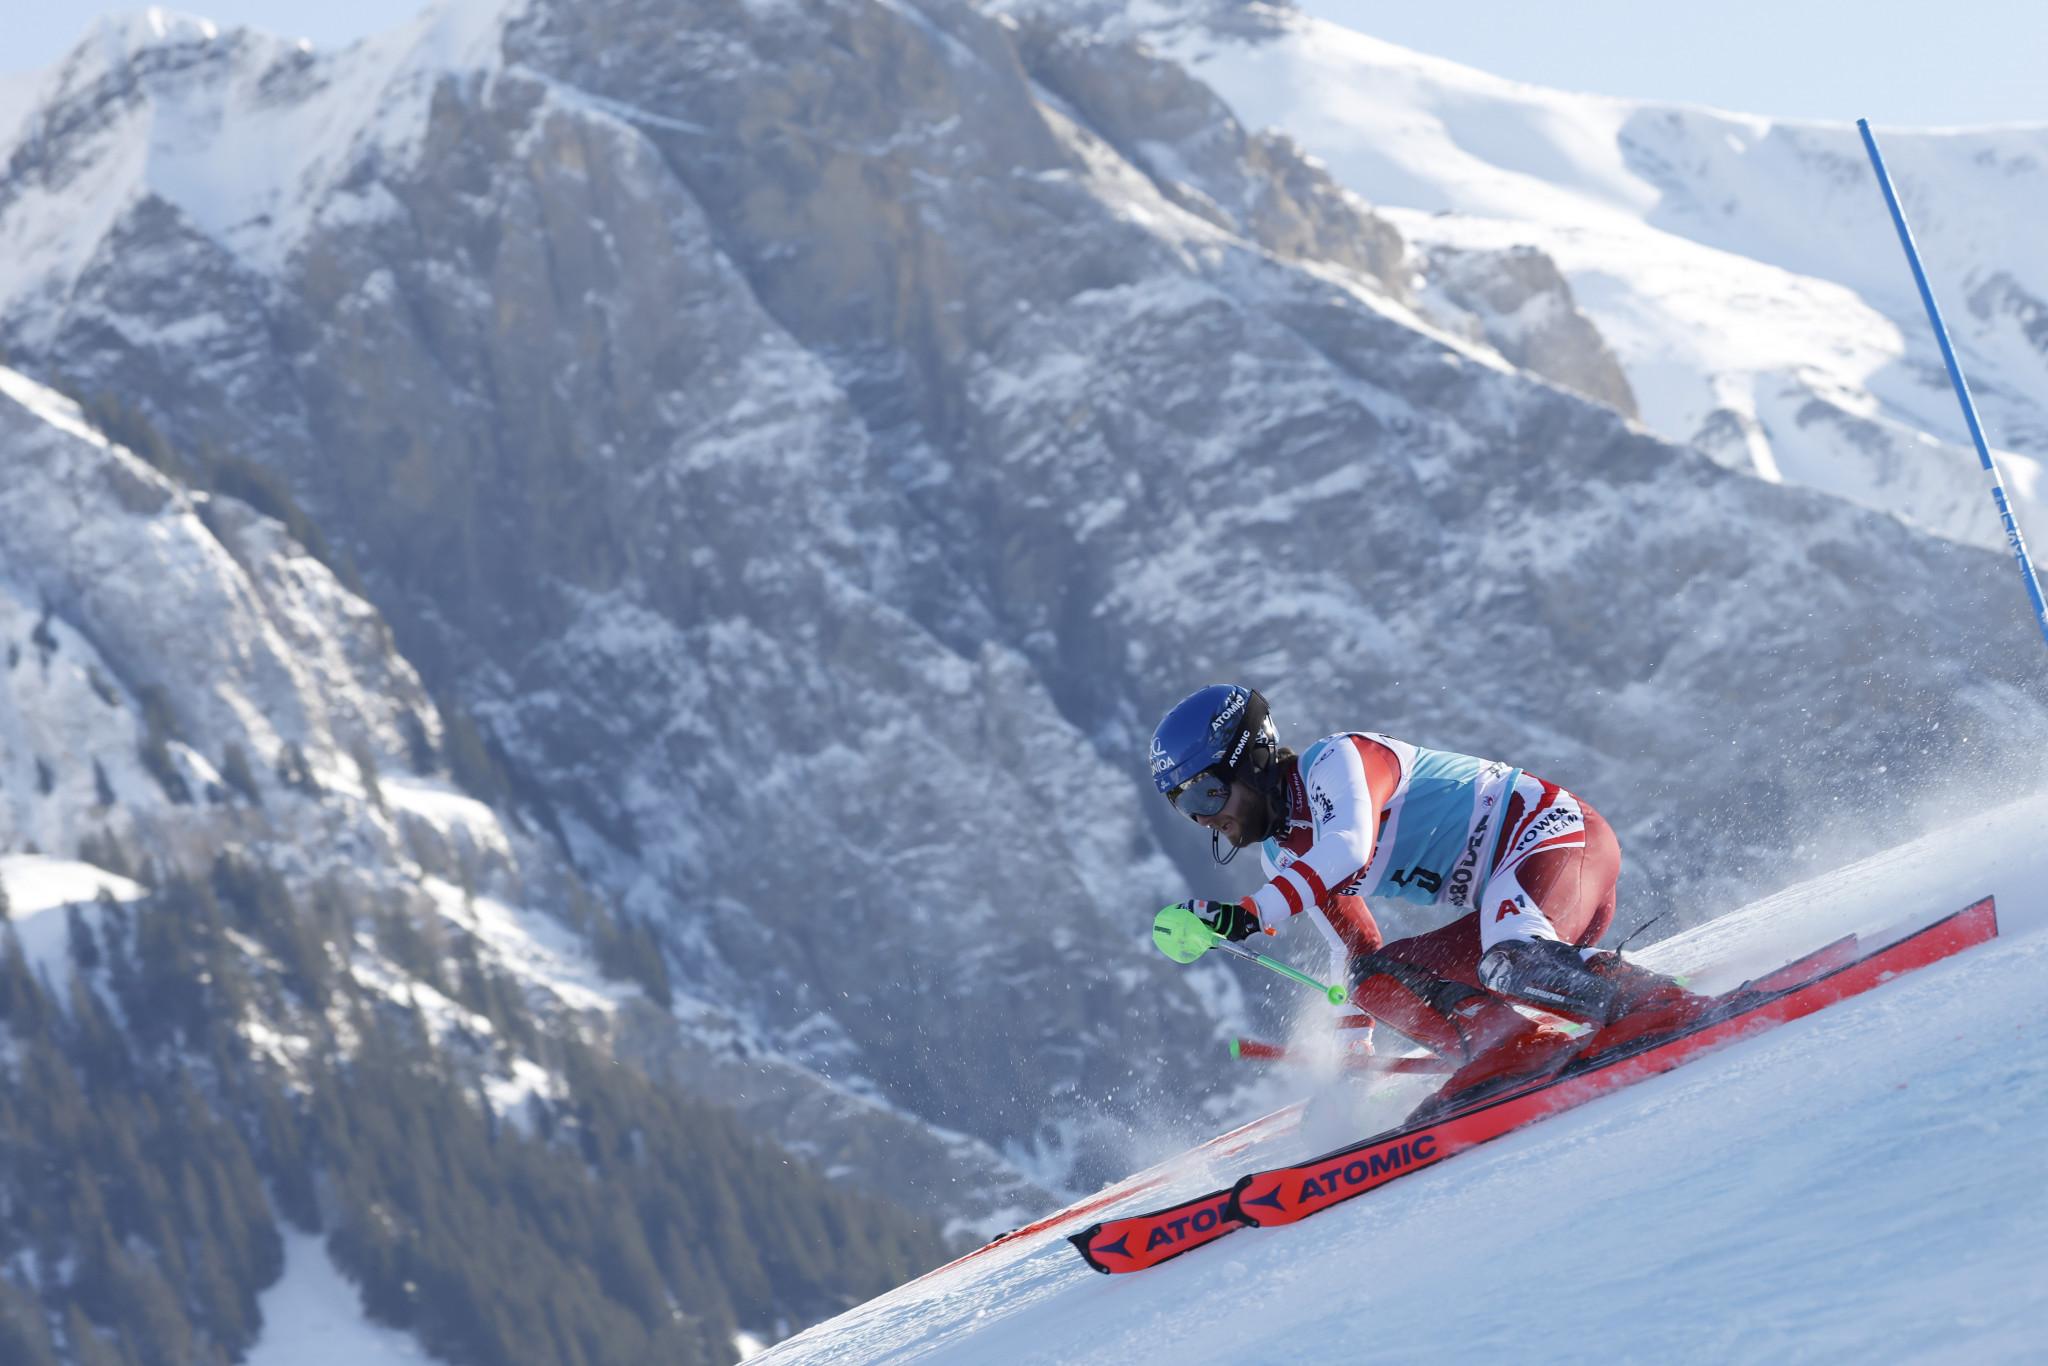 Schwarz earns slalom victory at FIS Alpine Ski World Cup in Adelboden